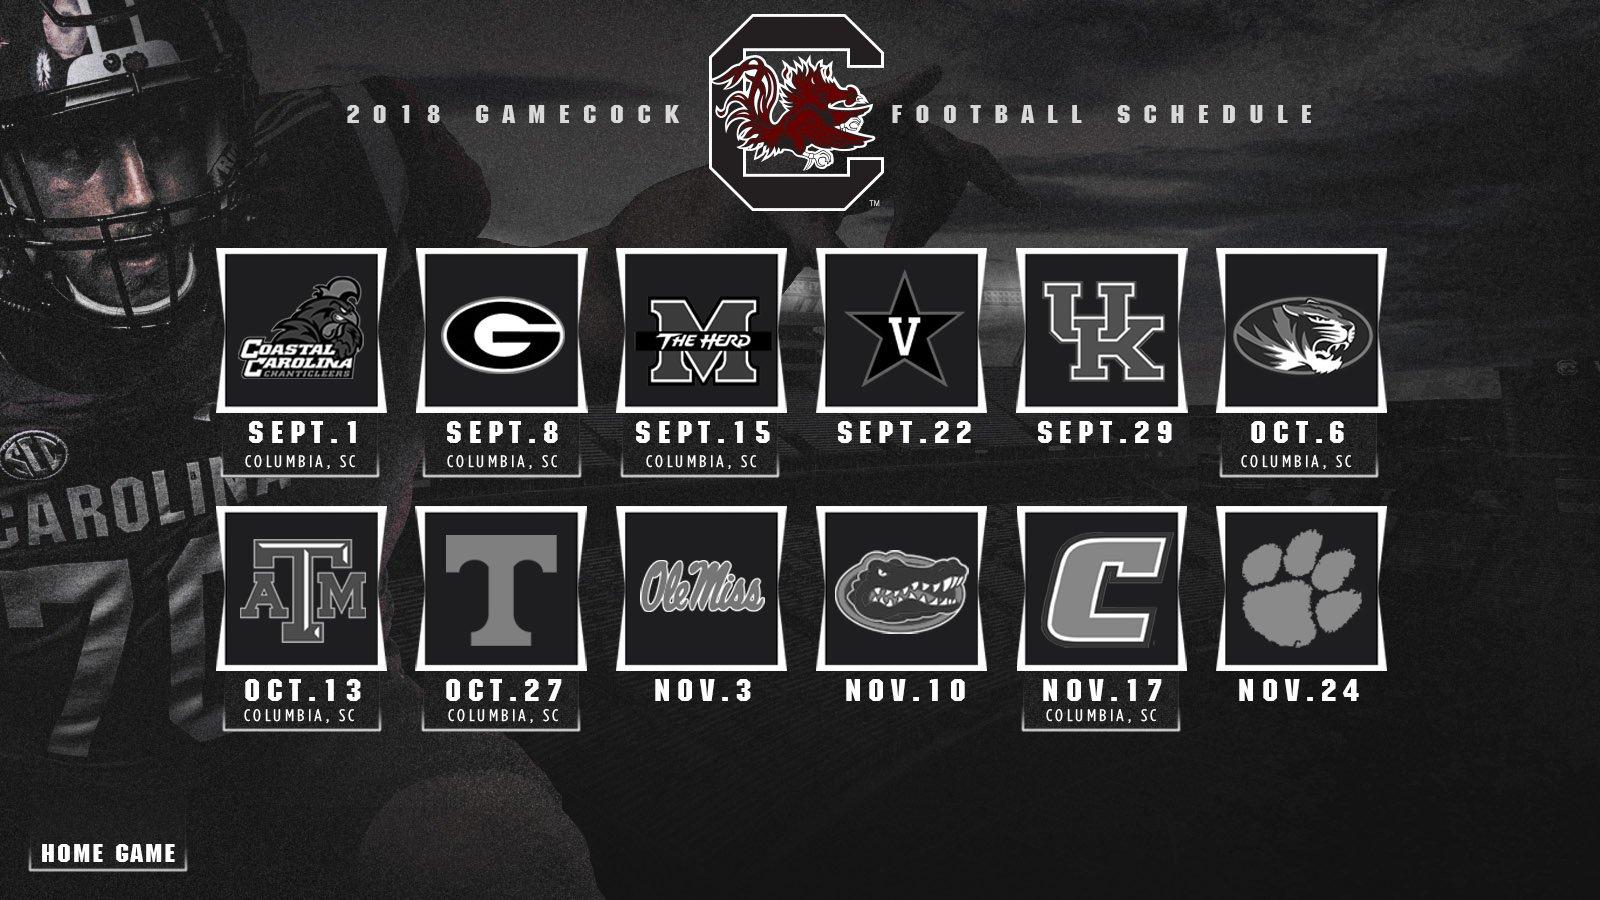 USC 2018 Schedule (Source: USC Athletics)